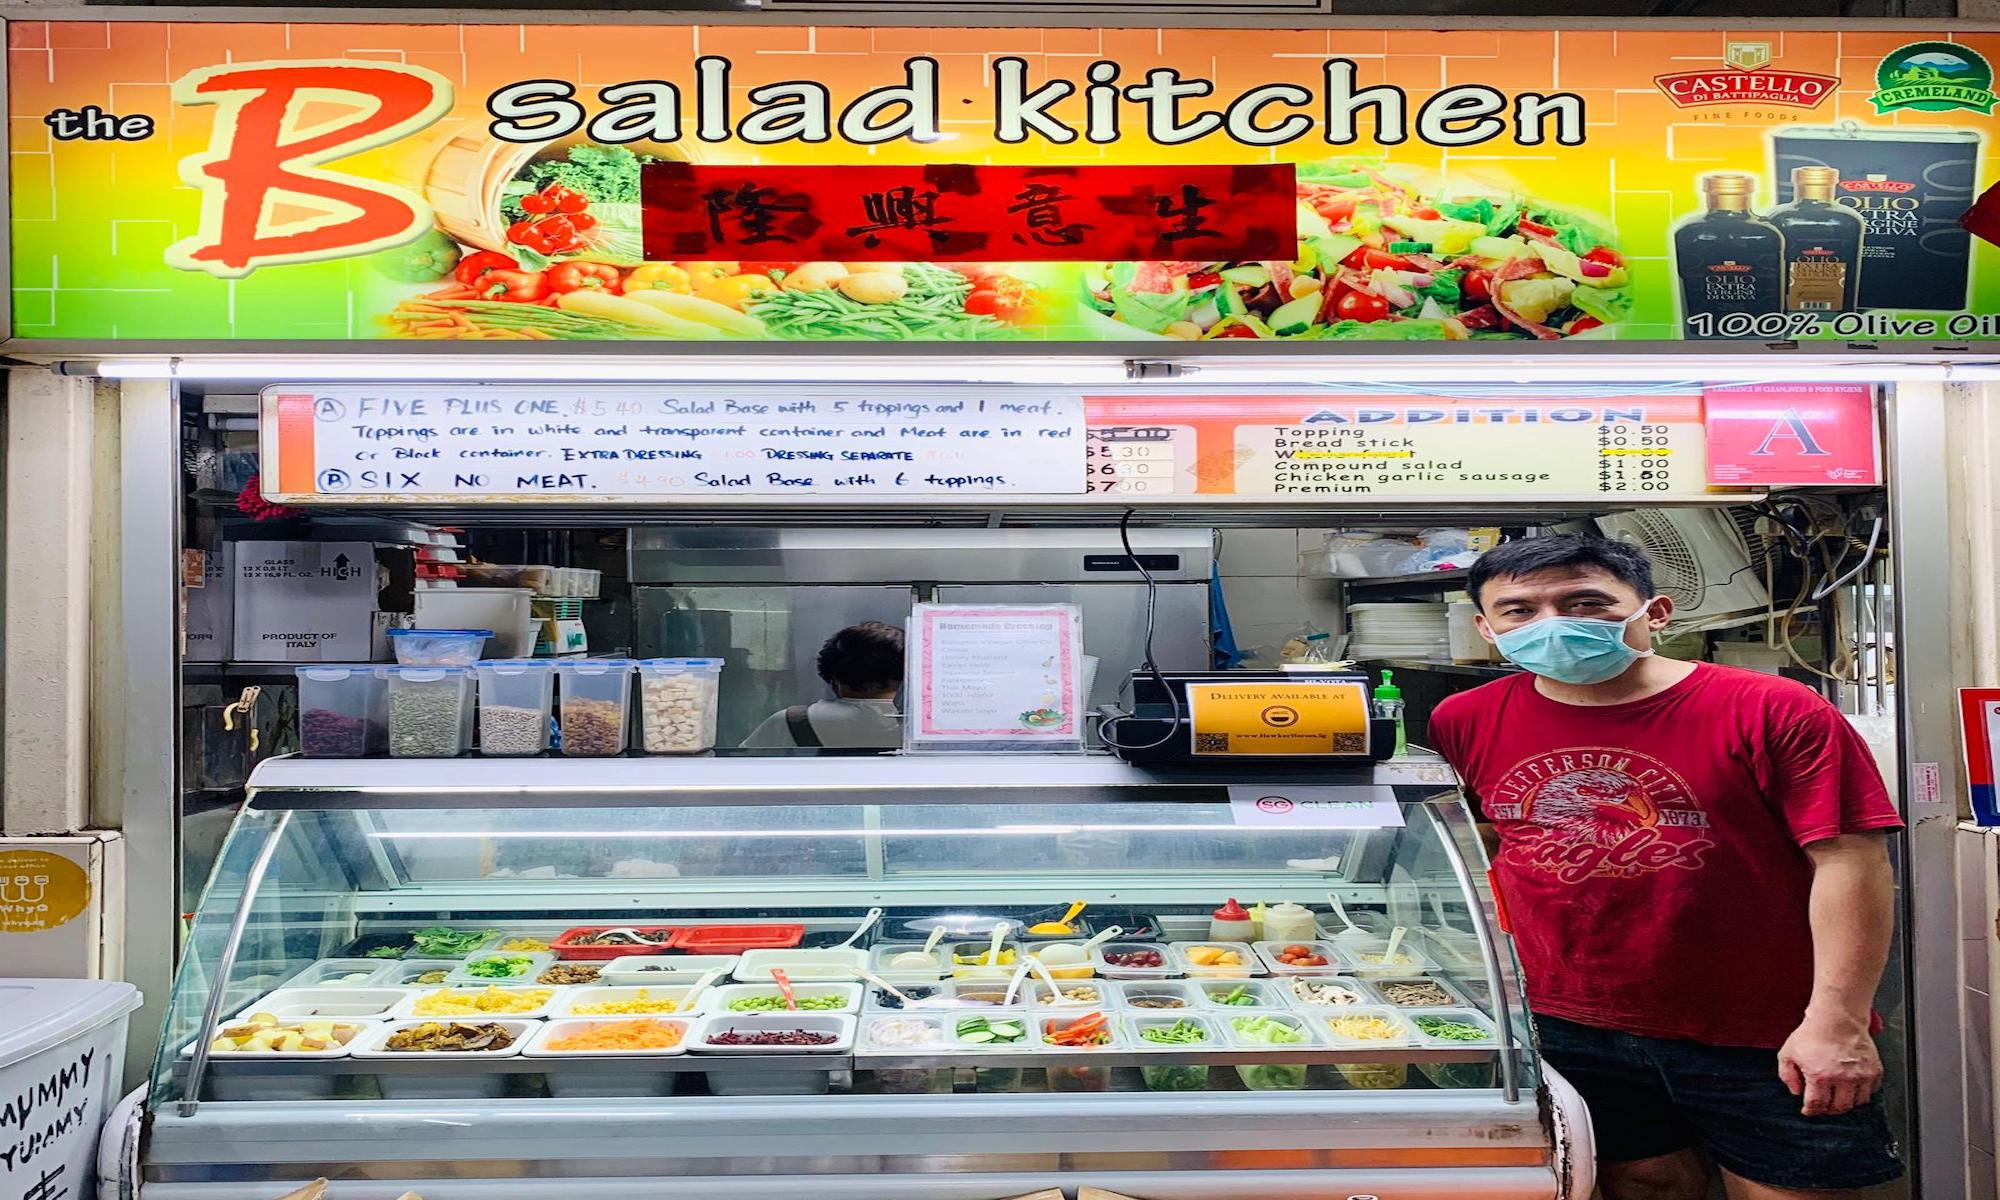 The B Salad Kitchen